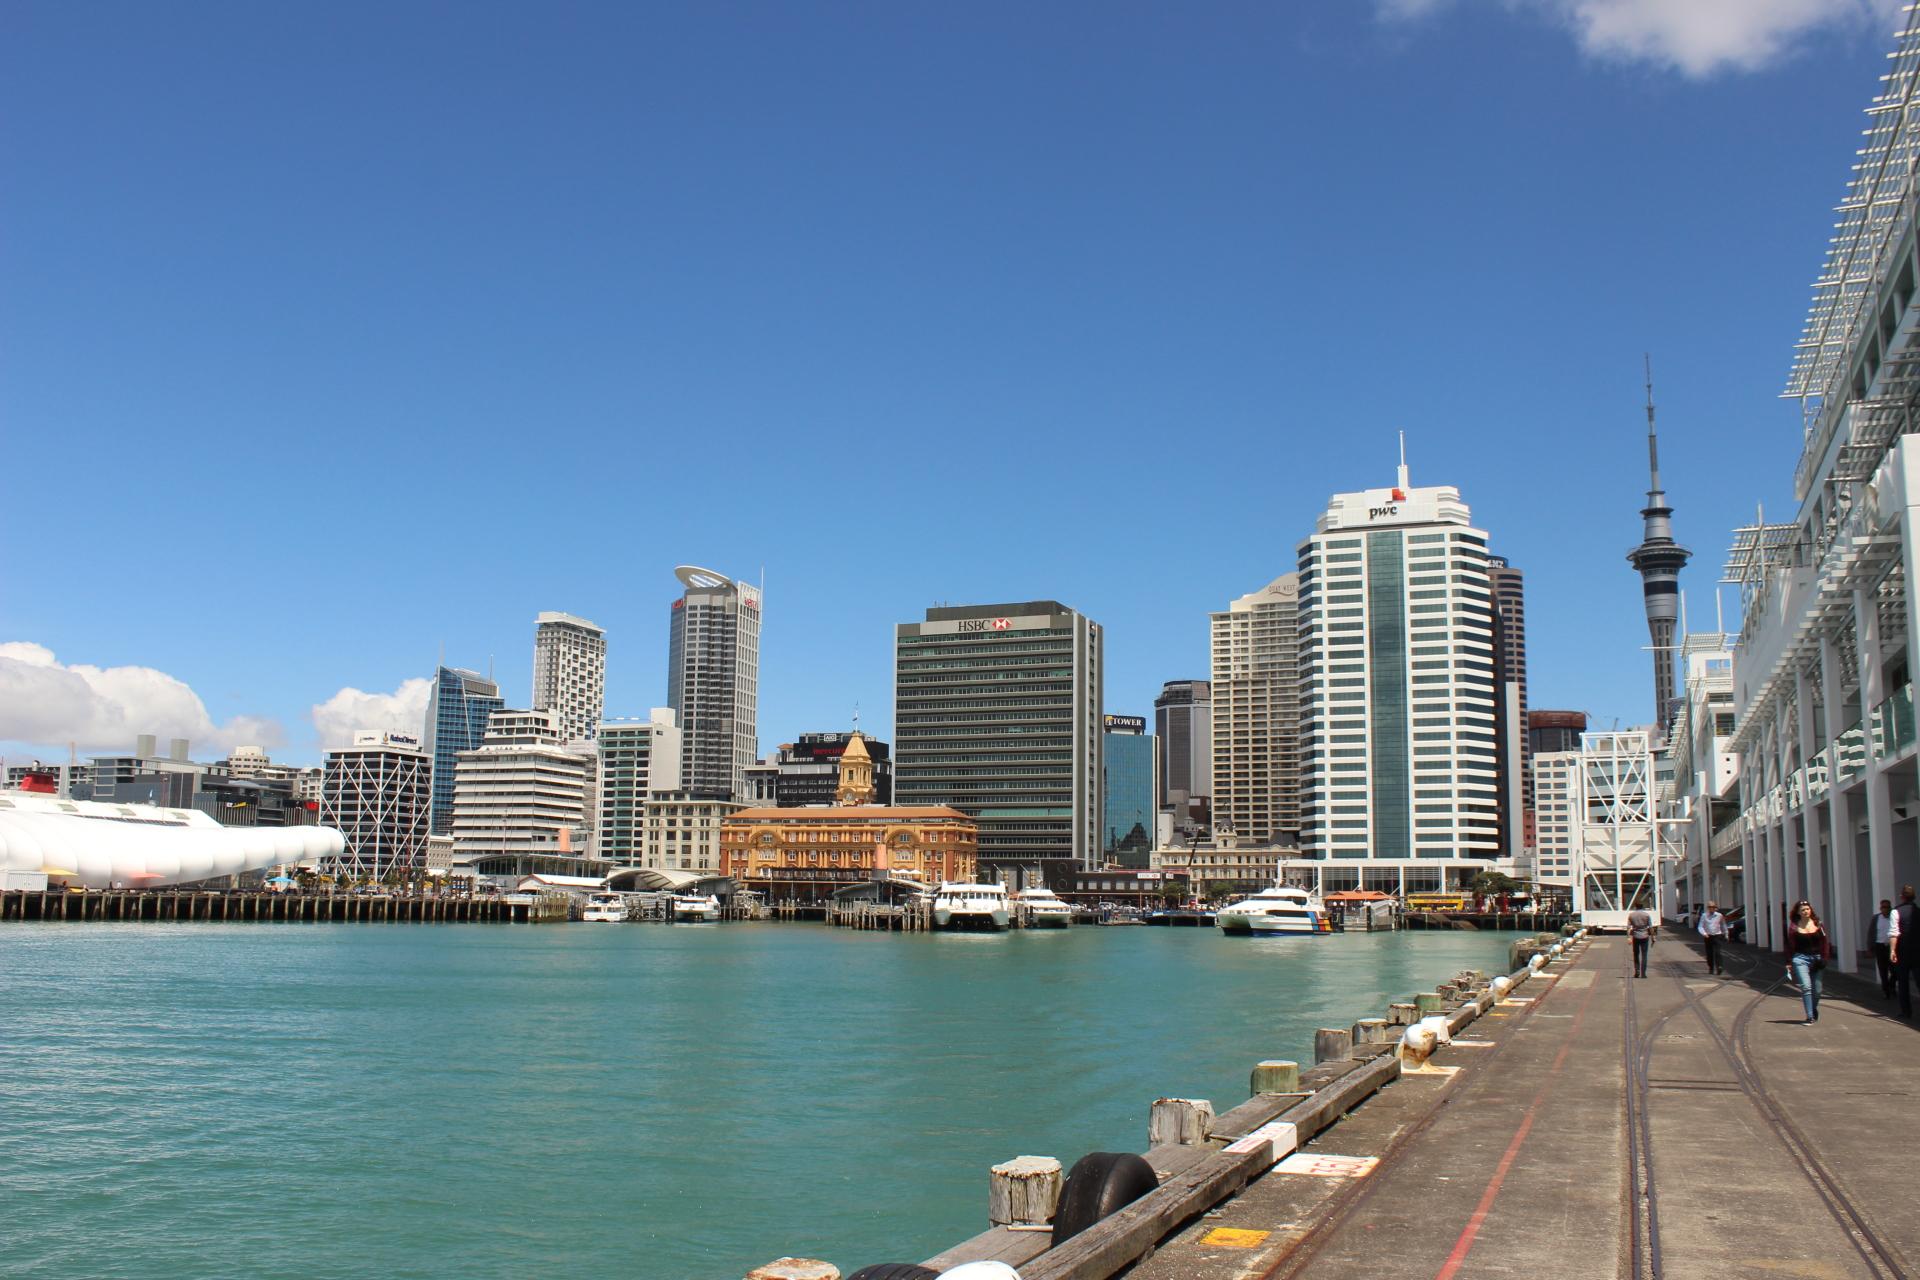 2016 New Zealand and Australia Trip, Part 1: Wondering Through Auckland